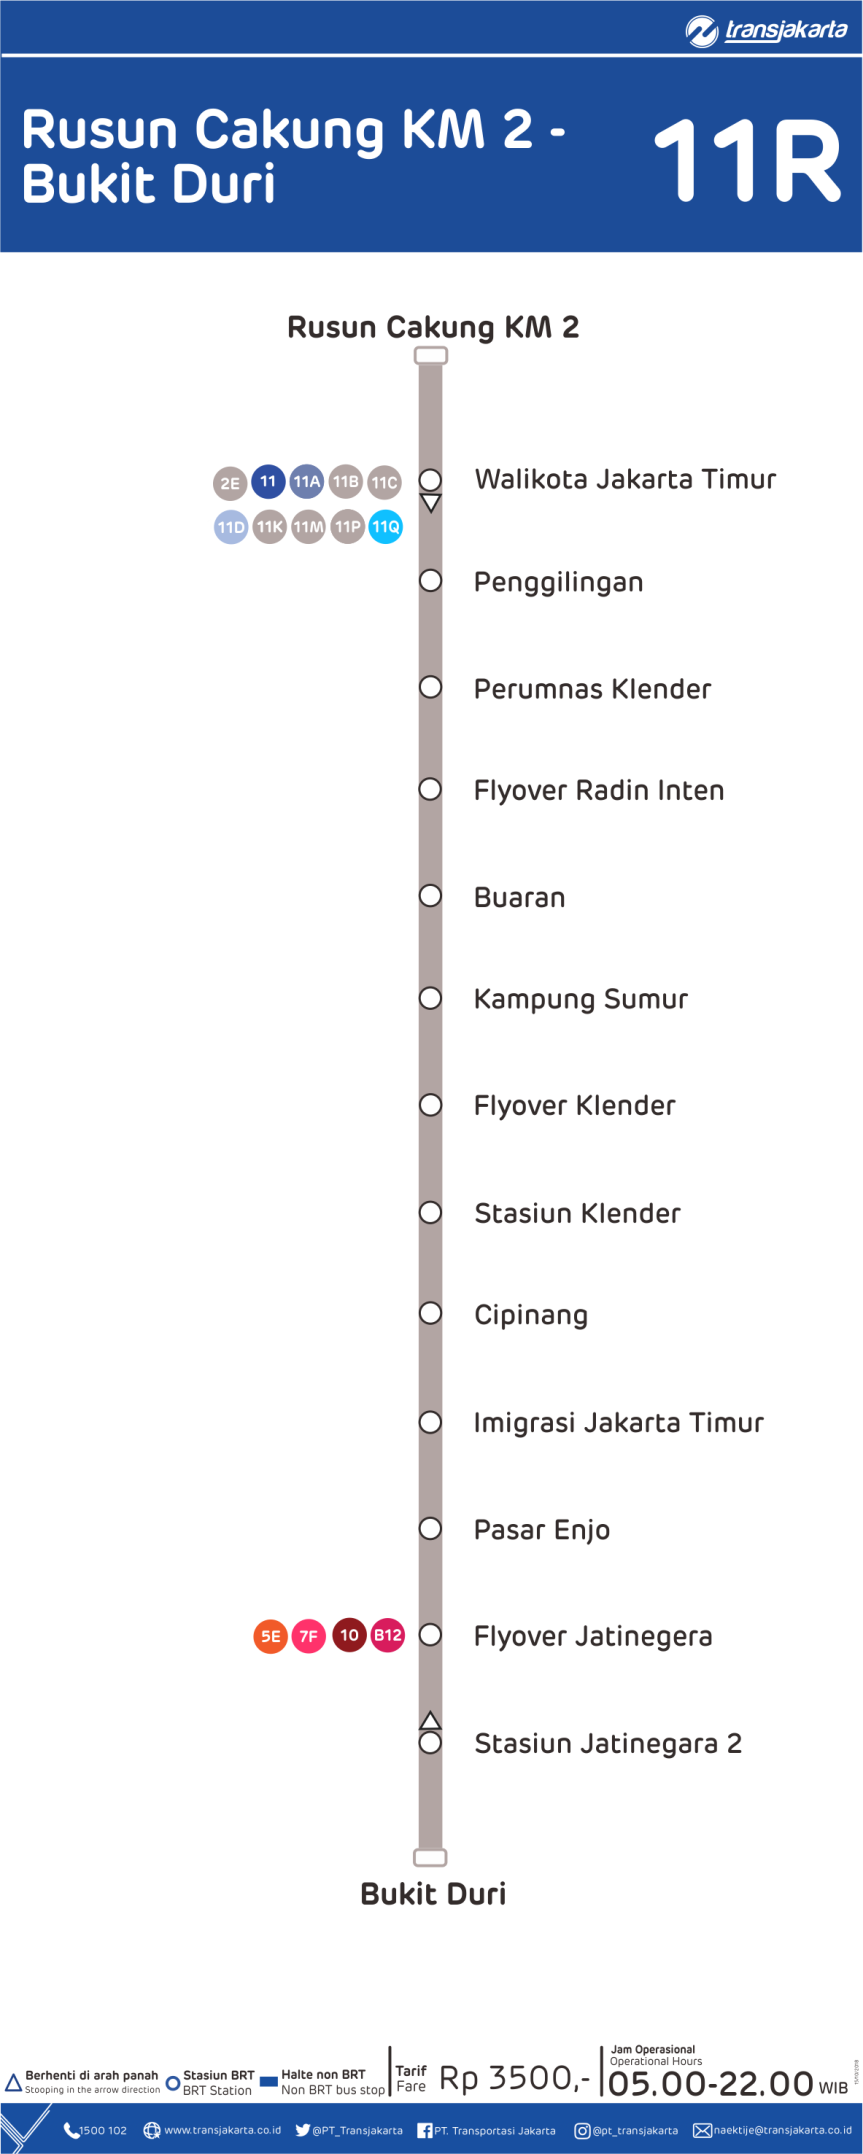 11R-Rusun-Cakung-KM-2-Bukit-Duri